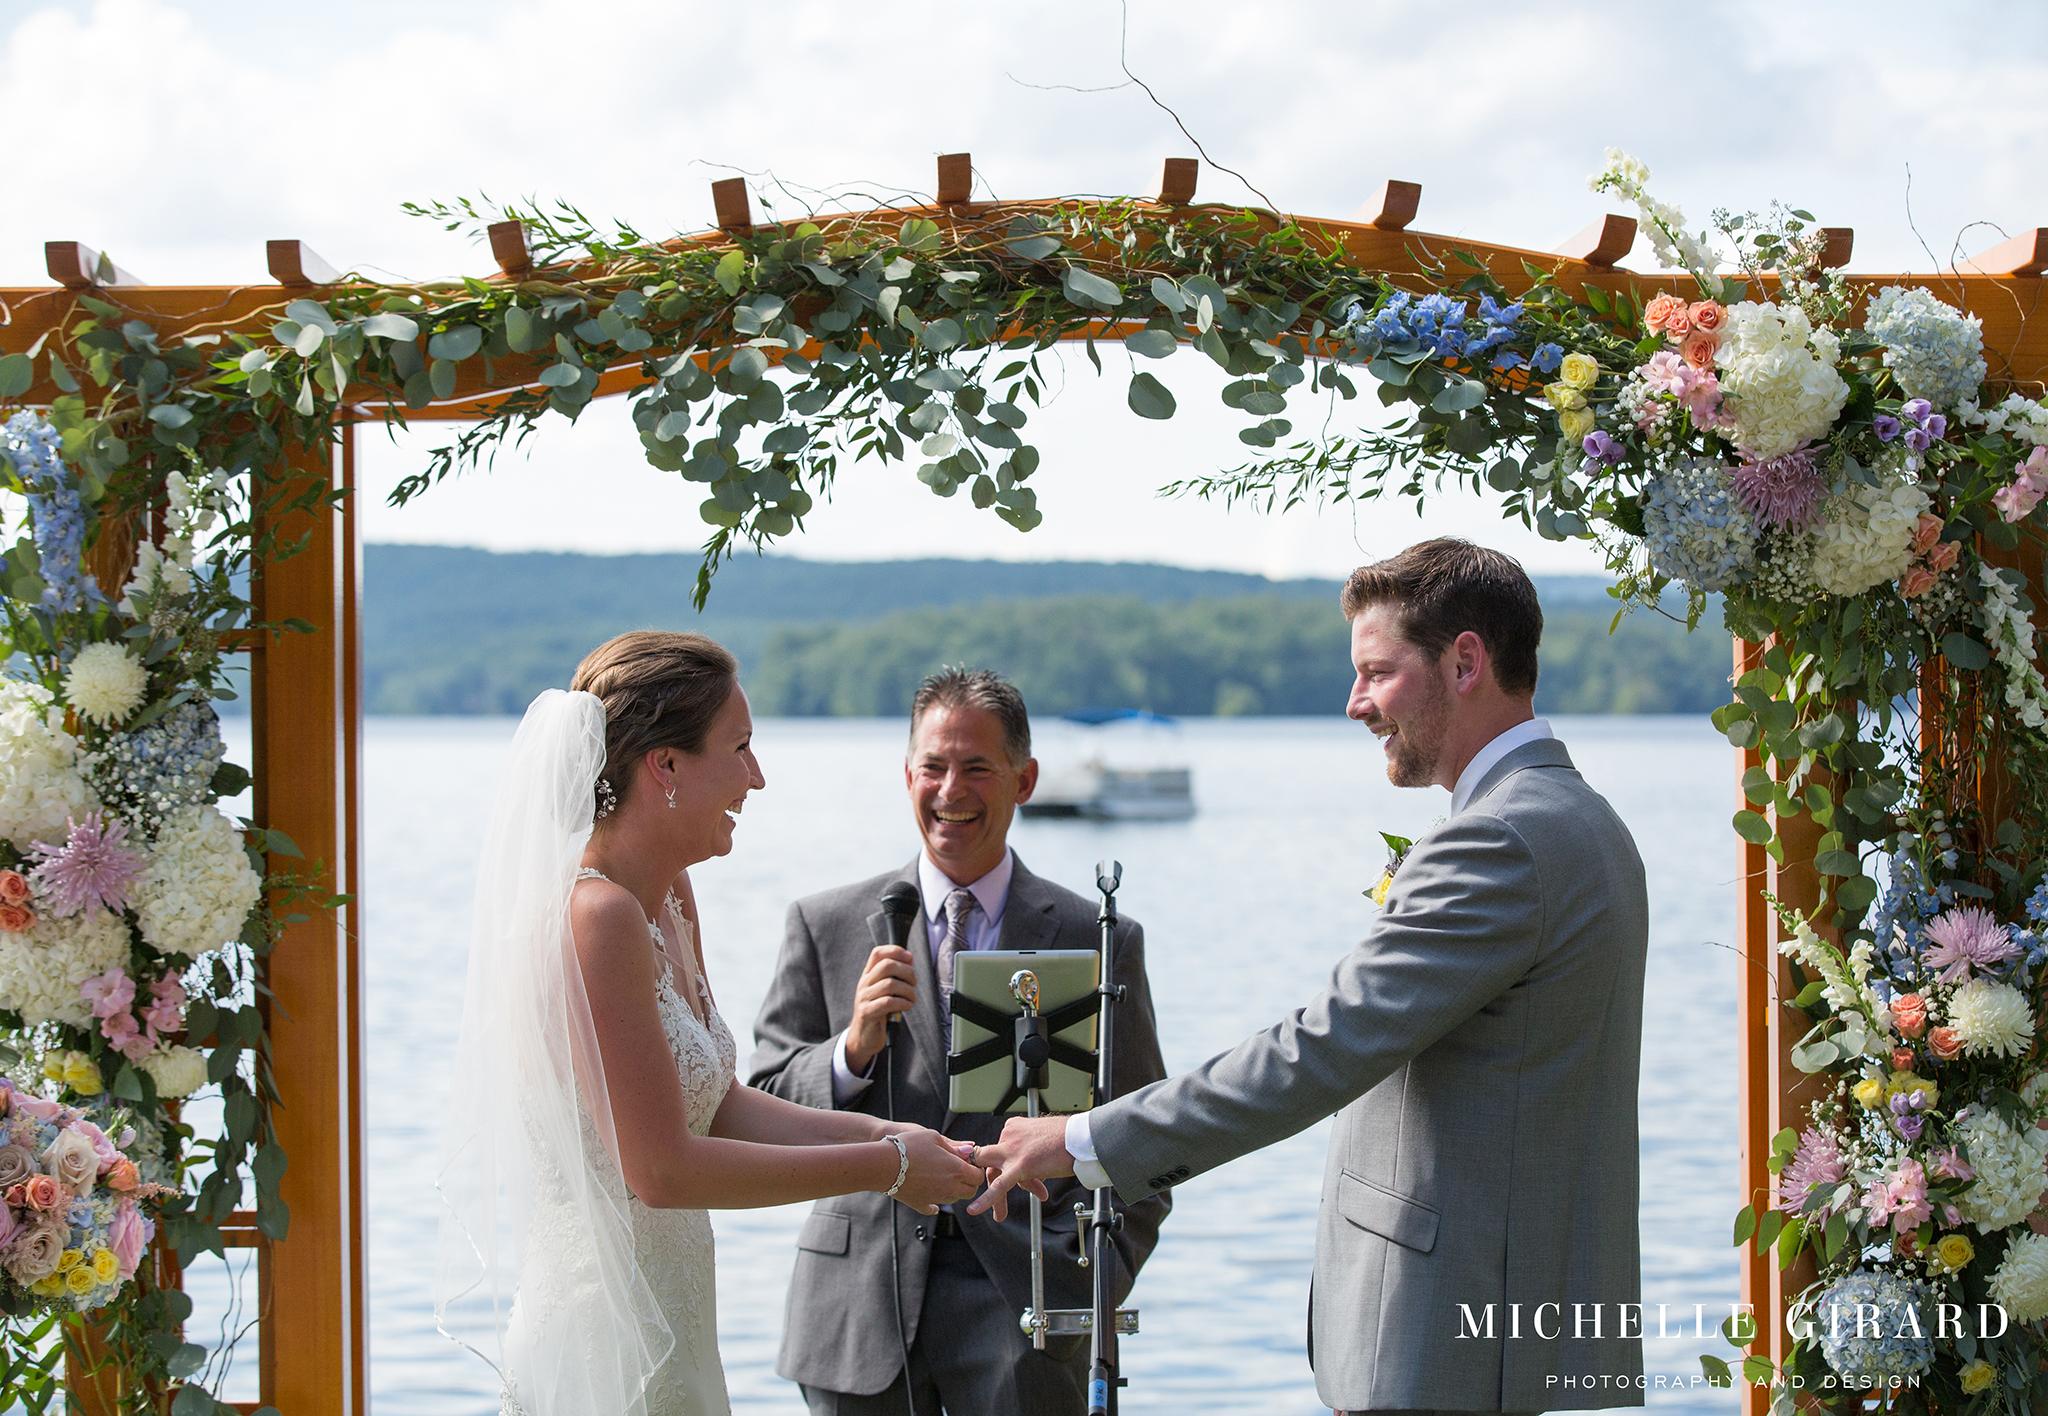 LakeWinnipesaukeeWedding_MeredithNH_LakesideTentWedding_MichelleGirardPhotography3.jpg